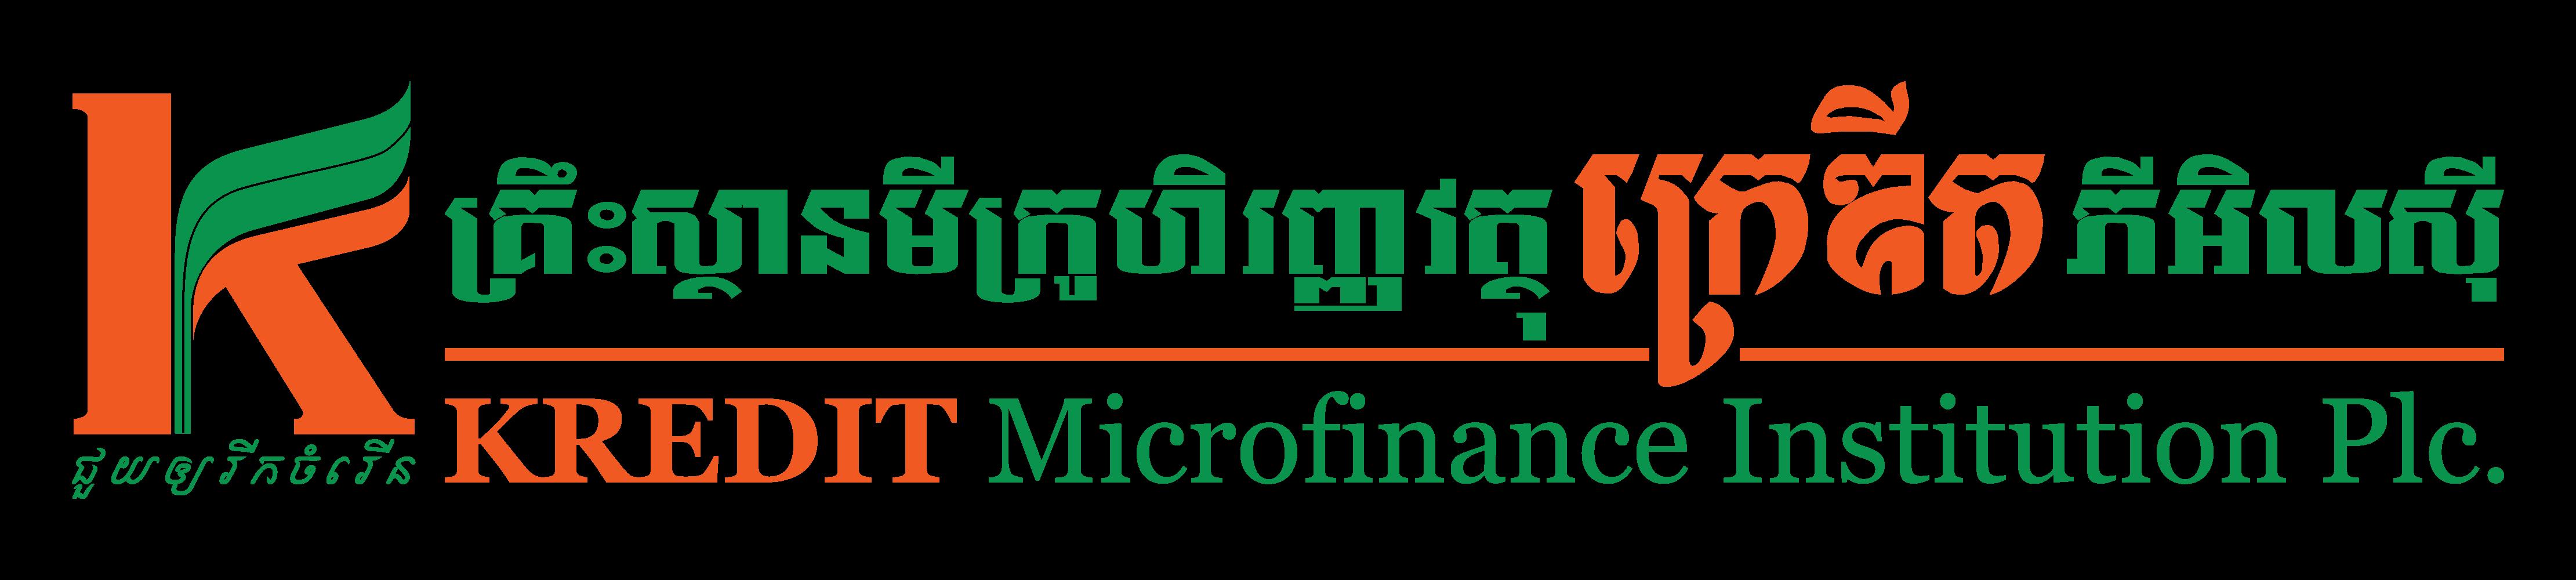 Kredit Microfinance